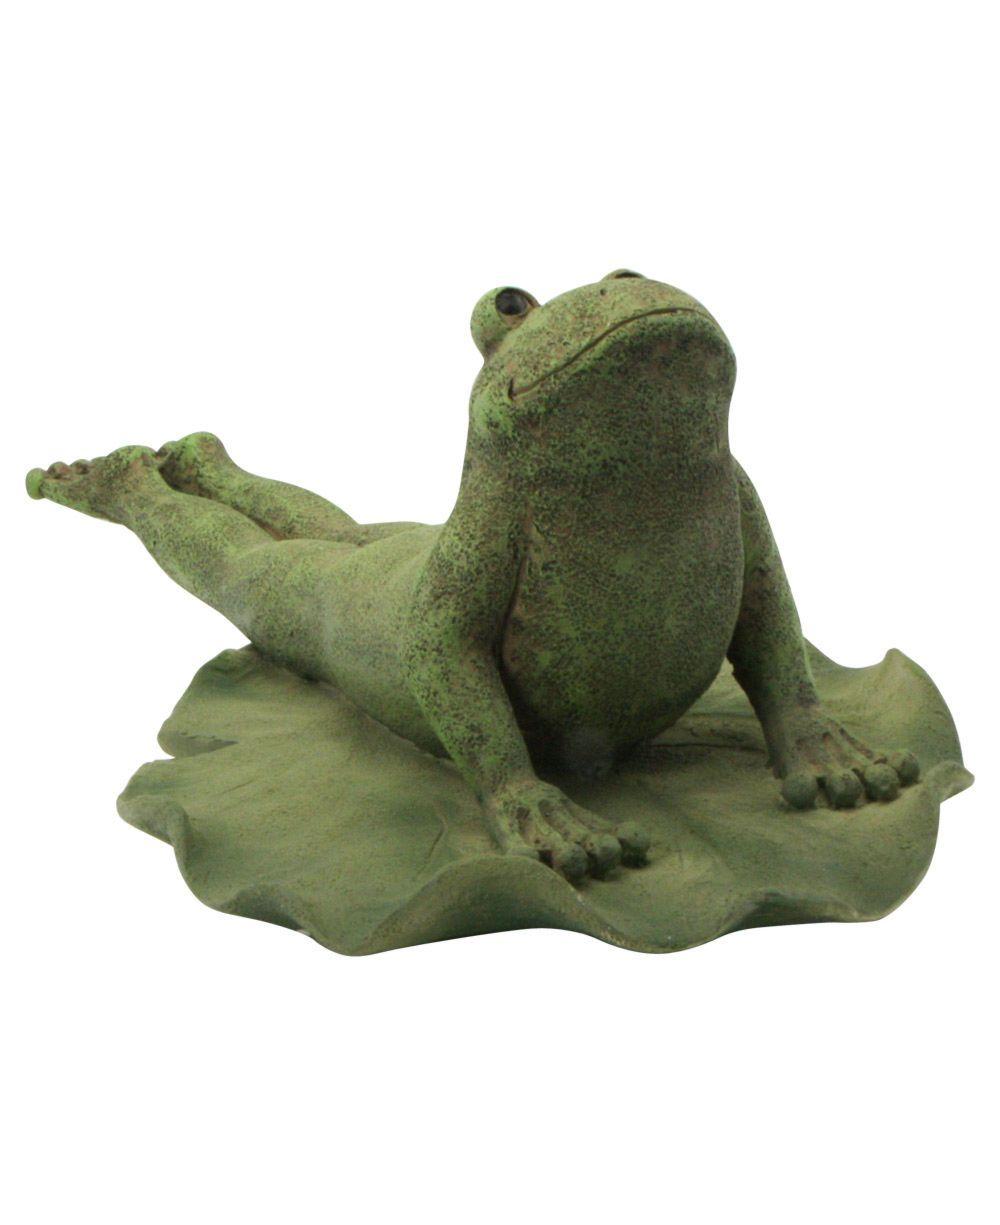 Yoga Frog Garden Statues: Cobra Pose Frog